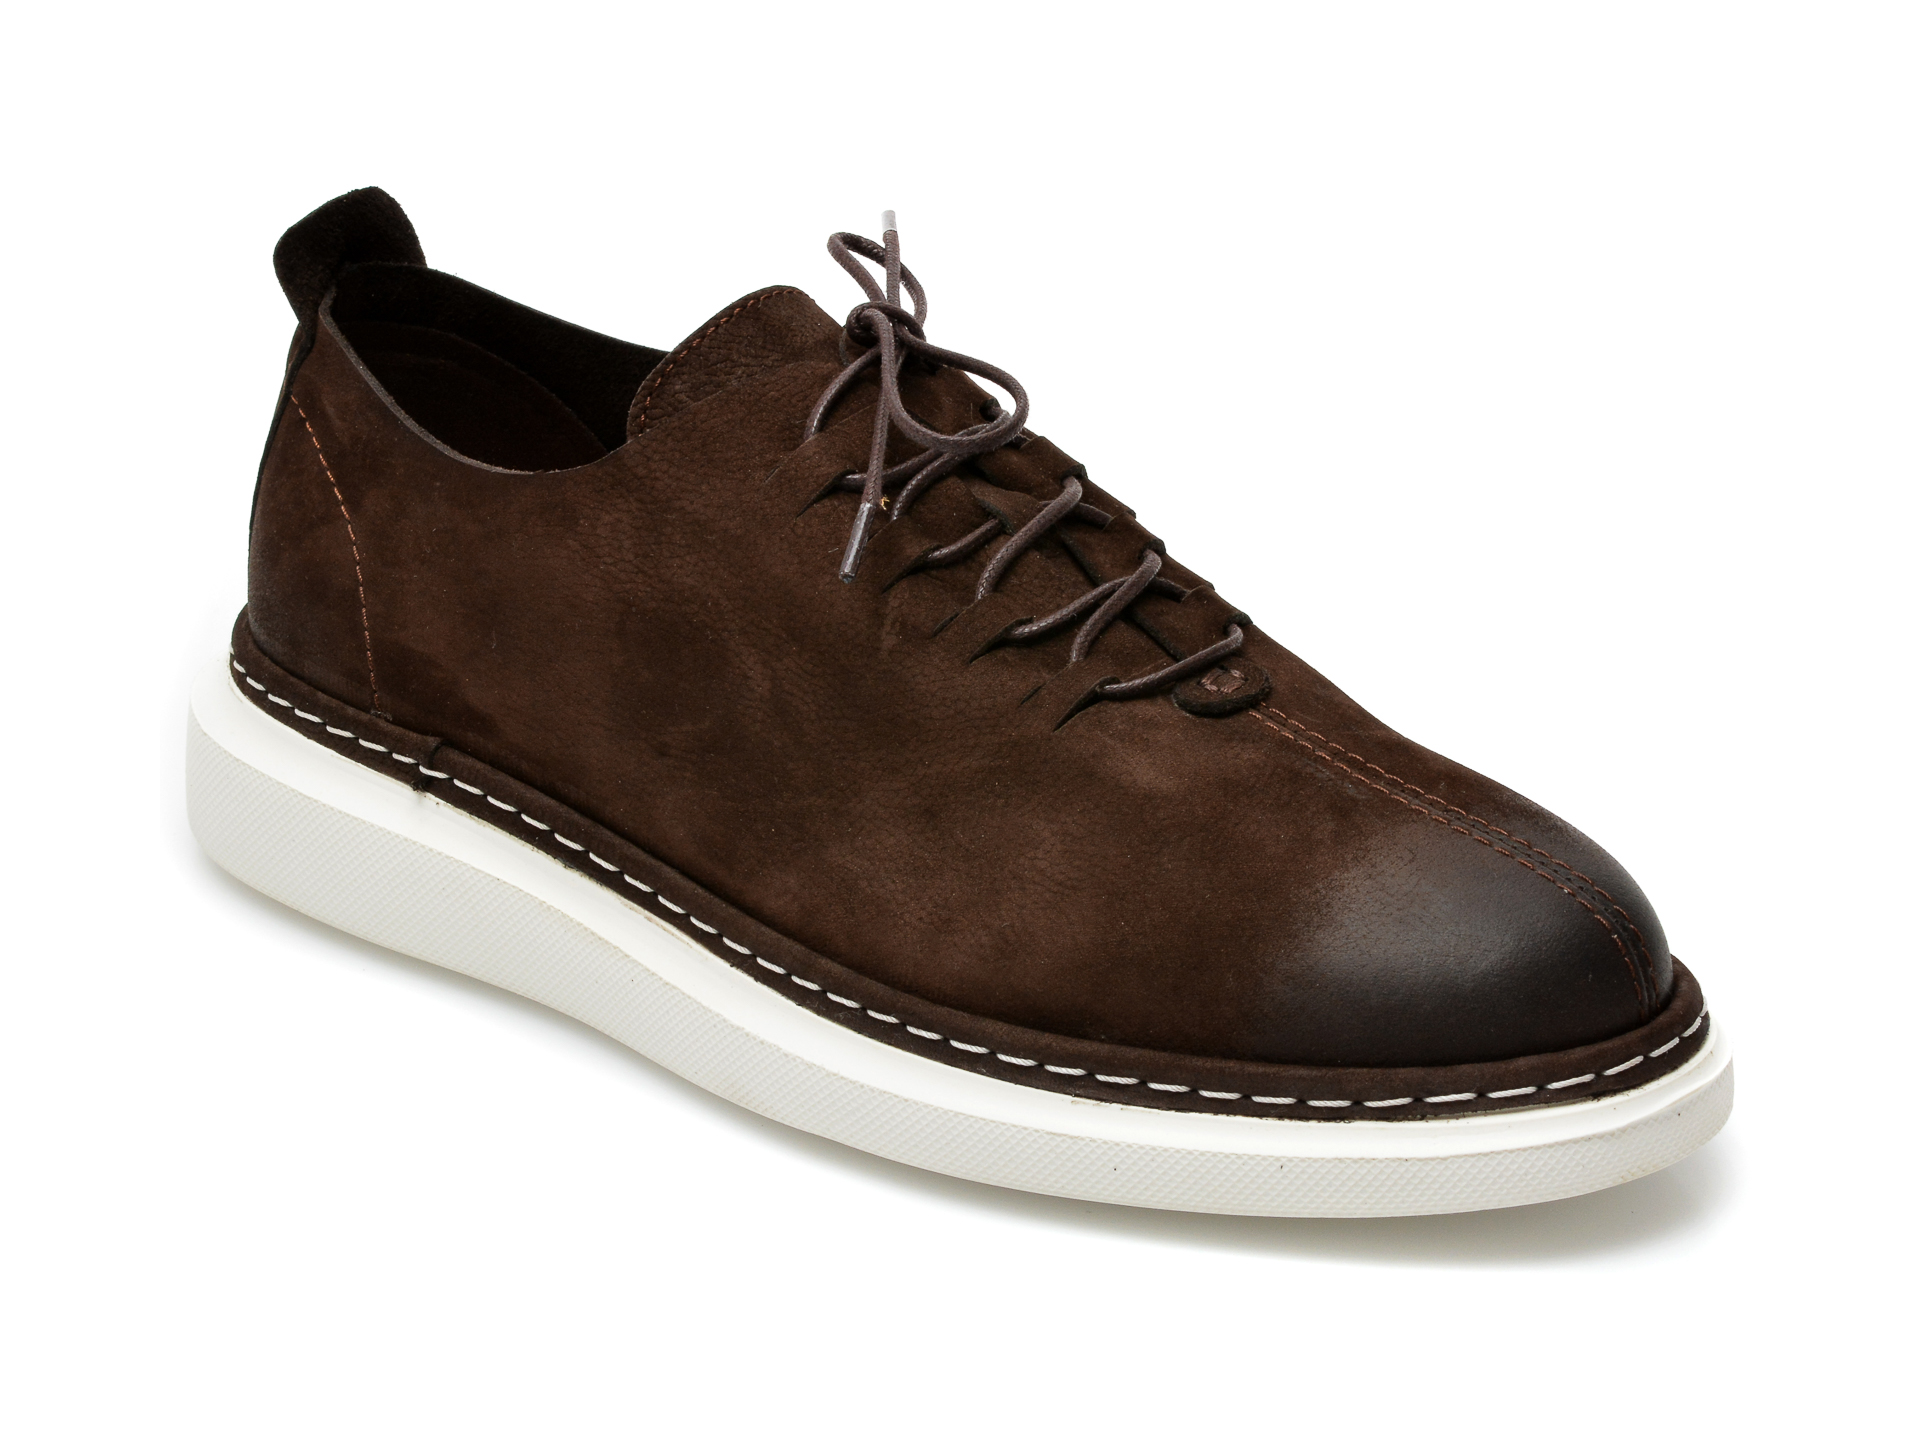 Pantofi OTTER maro inchis, 21KL801, din nabuc imagine otter.ro 2021